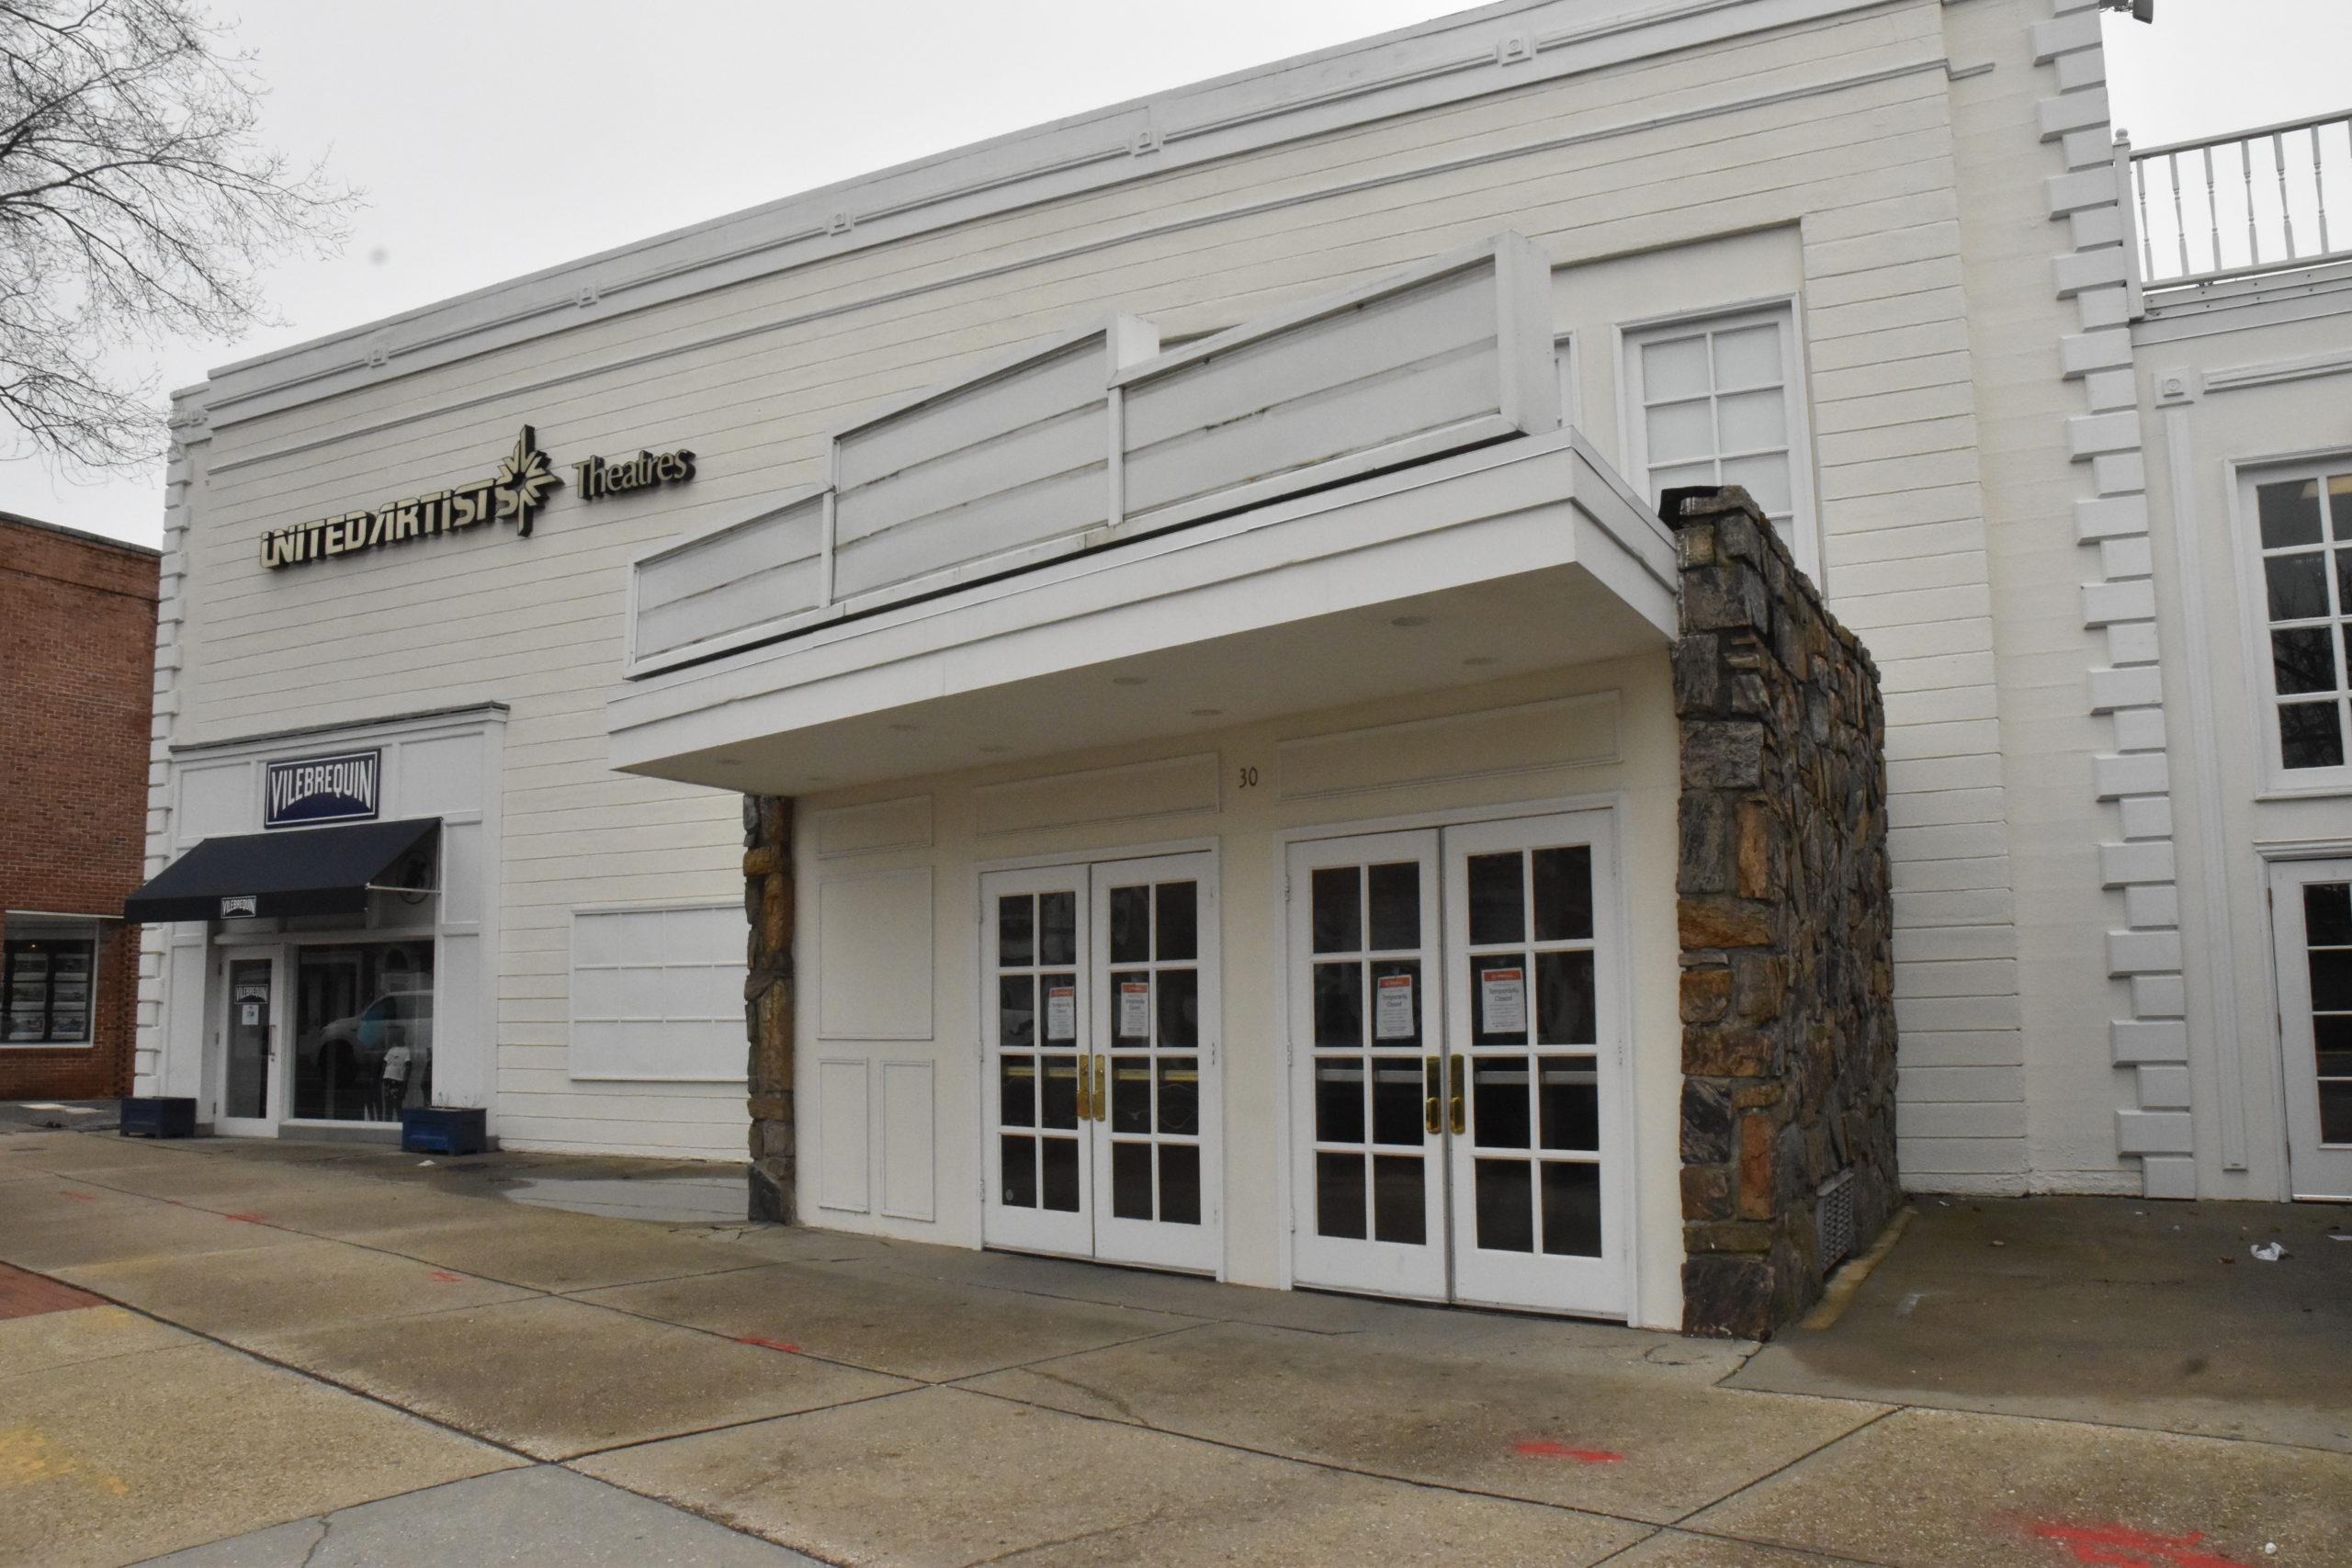 The marquee of the Regal UA Cinema in East Hampton is blank, reflecting its closure in response to the coronavirus criis. STEPHEN J. KOTZ